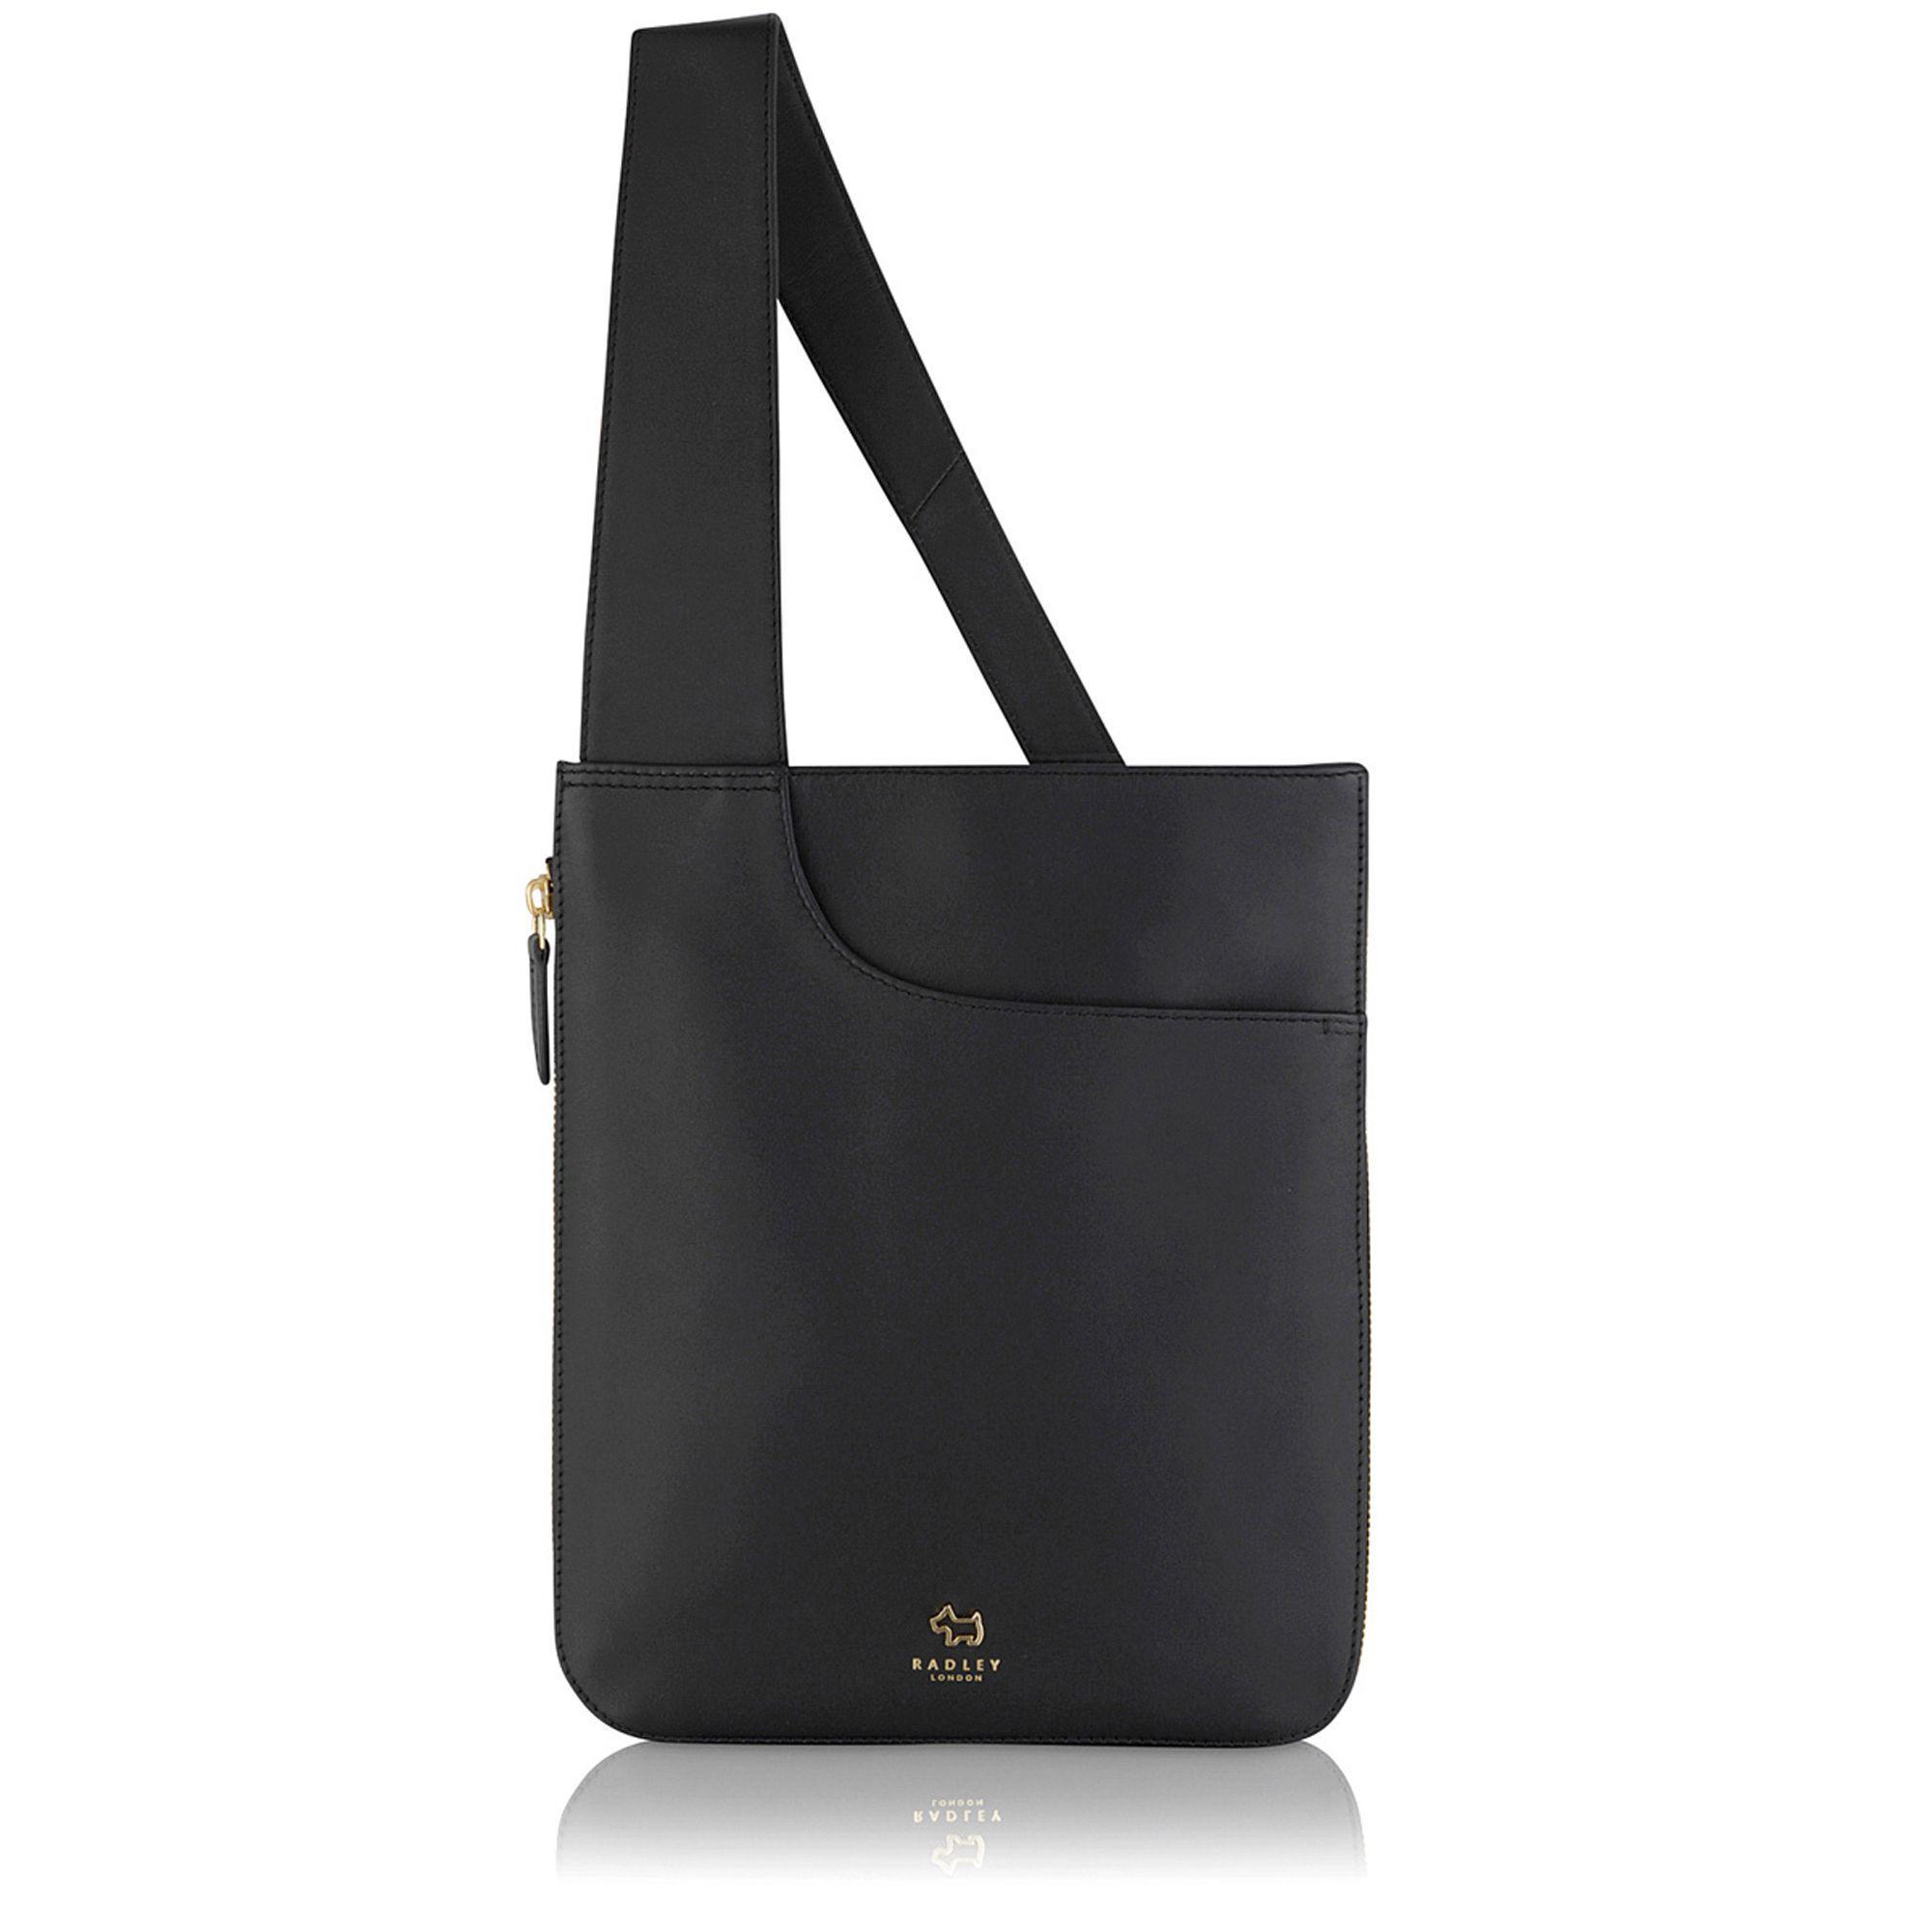 Radley Pocket Bag Medium Zip-top Cross Body Bag in Black - Lyst 9cce859ad870d